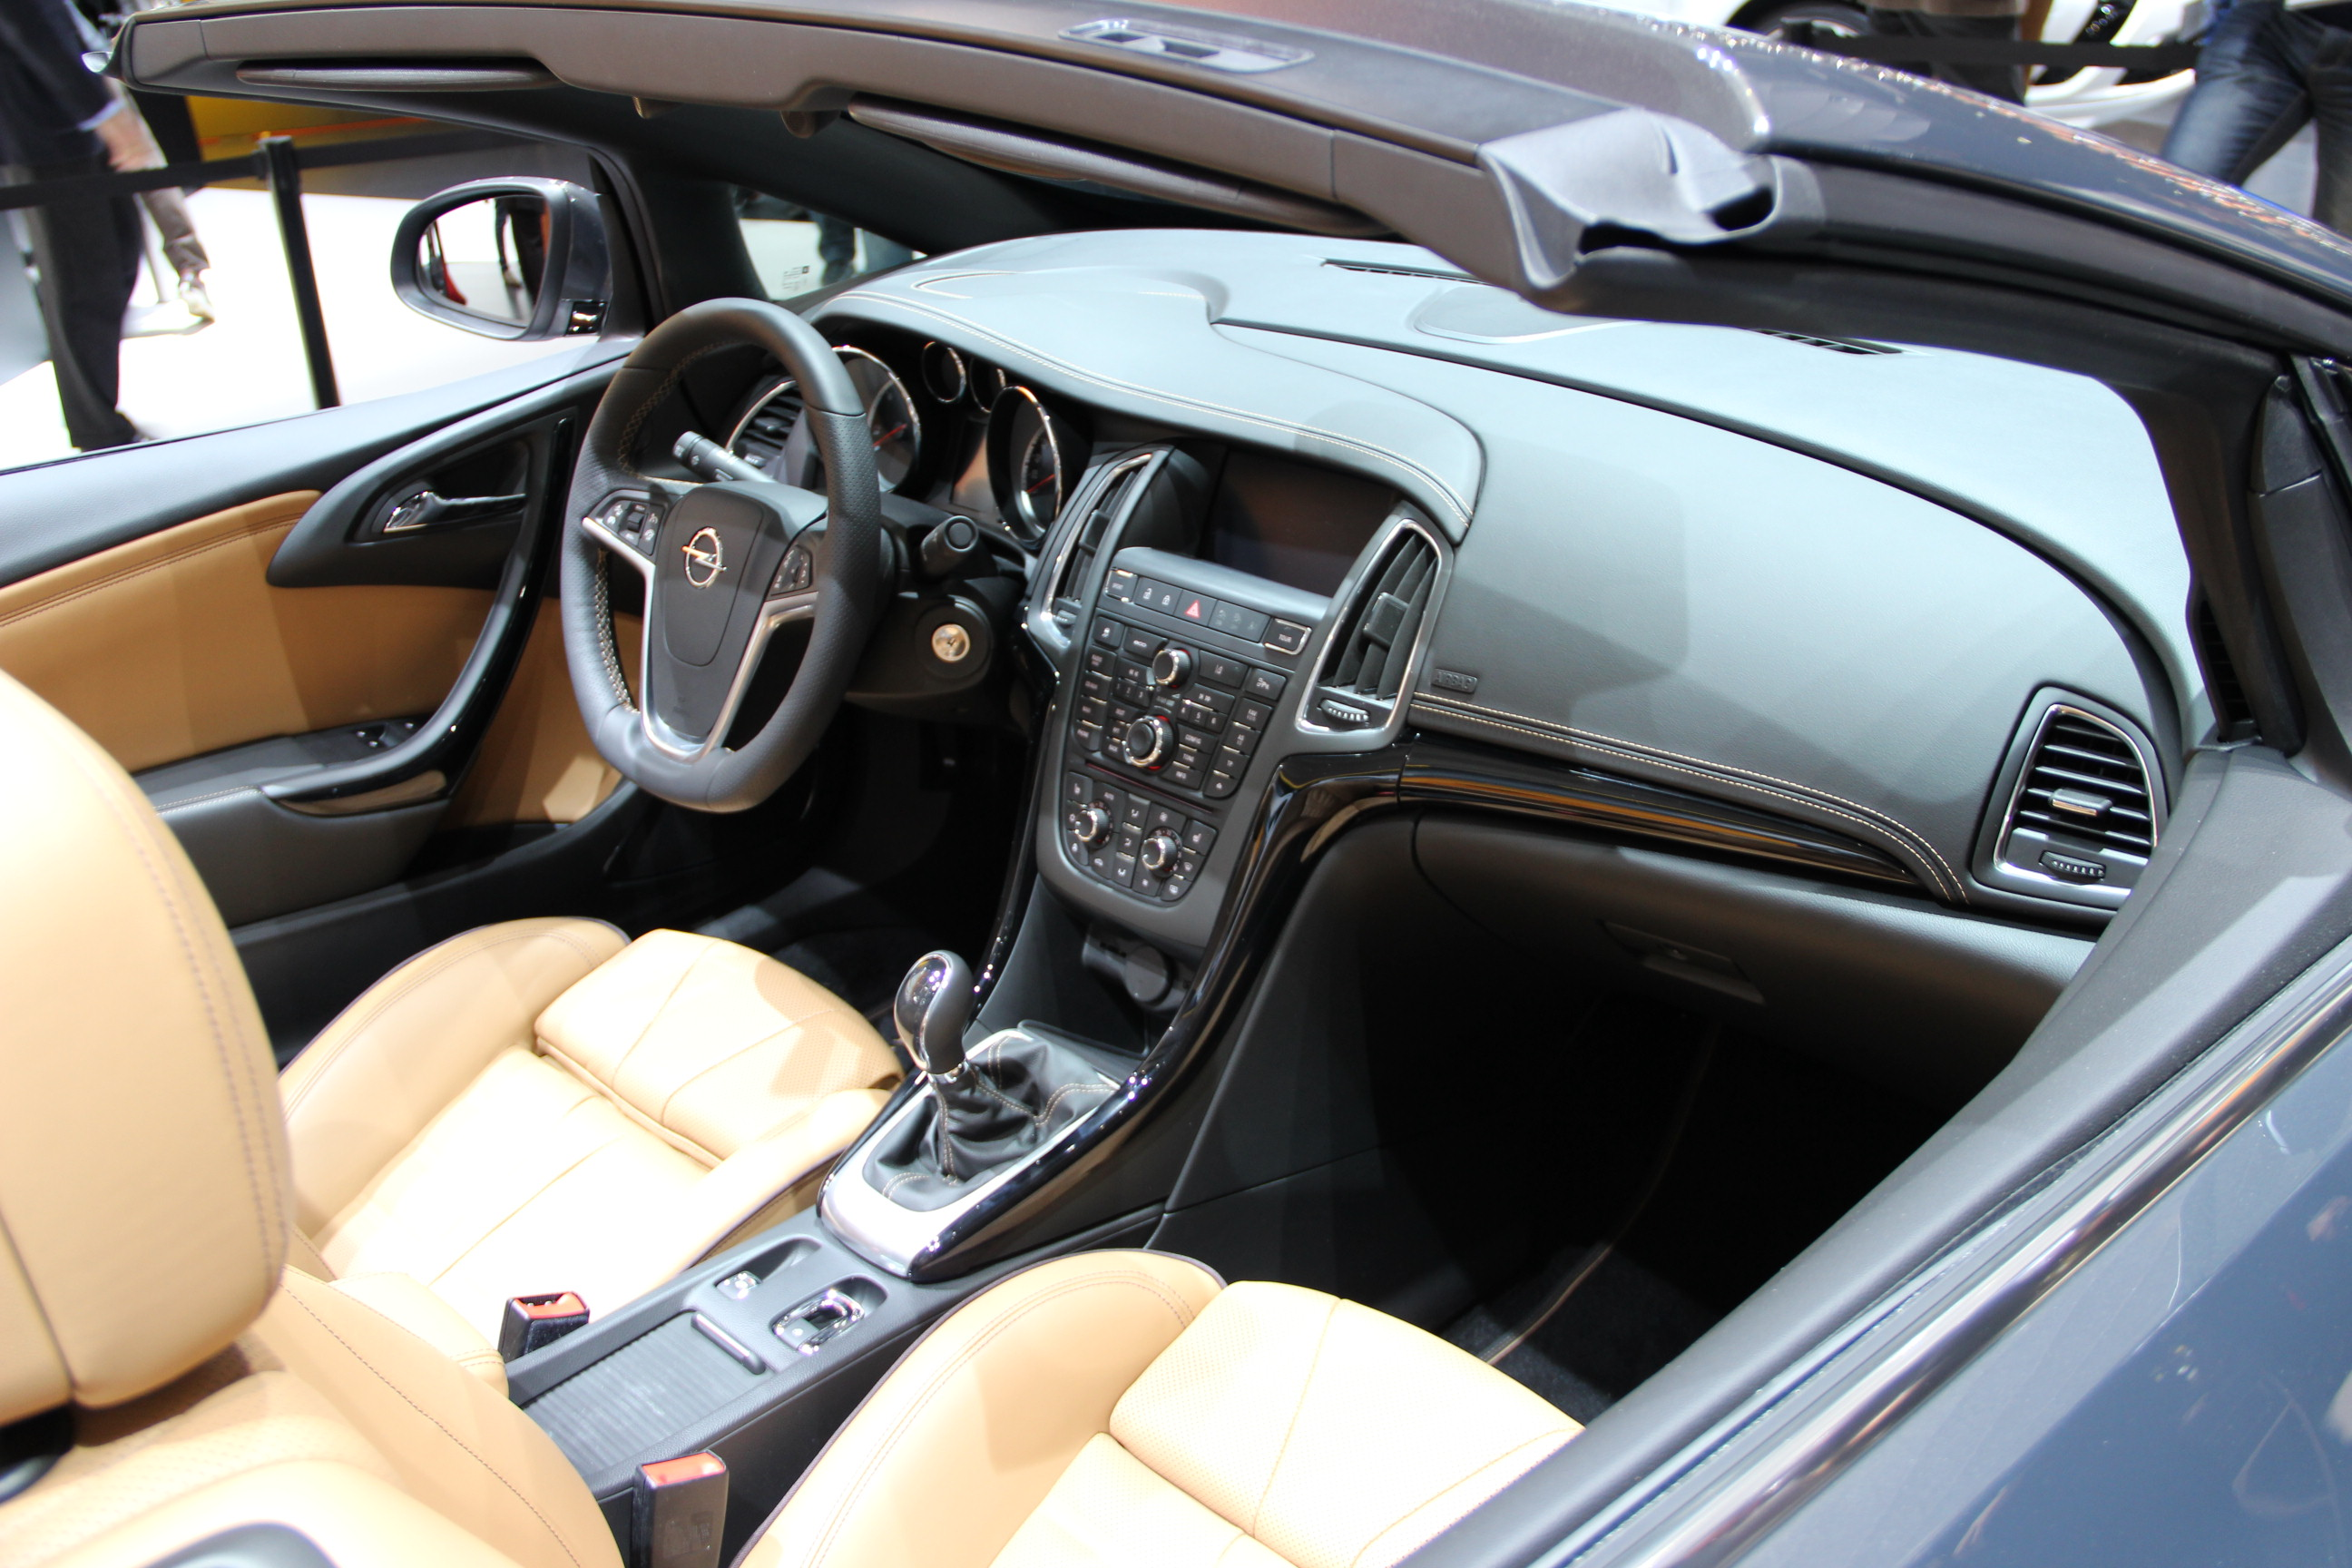 http://images.caradisiac.com/images/4/8/8/0/84880/S0-En-direct-de-Geneve-2013-Opel-Cascada-jolie-287009.jpg